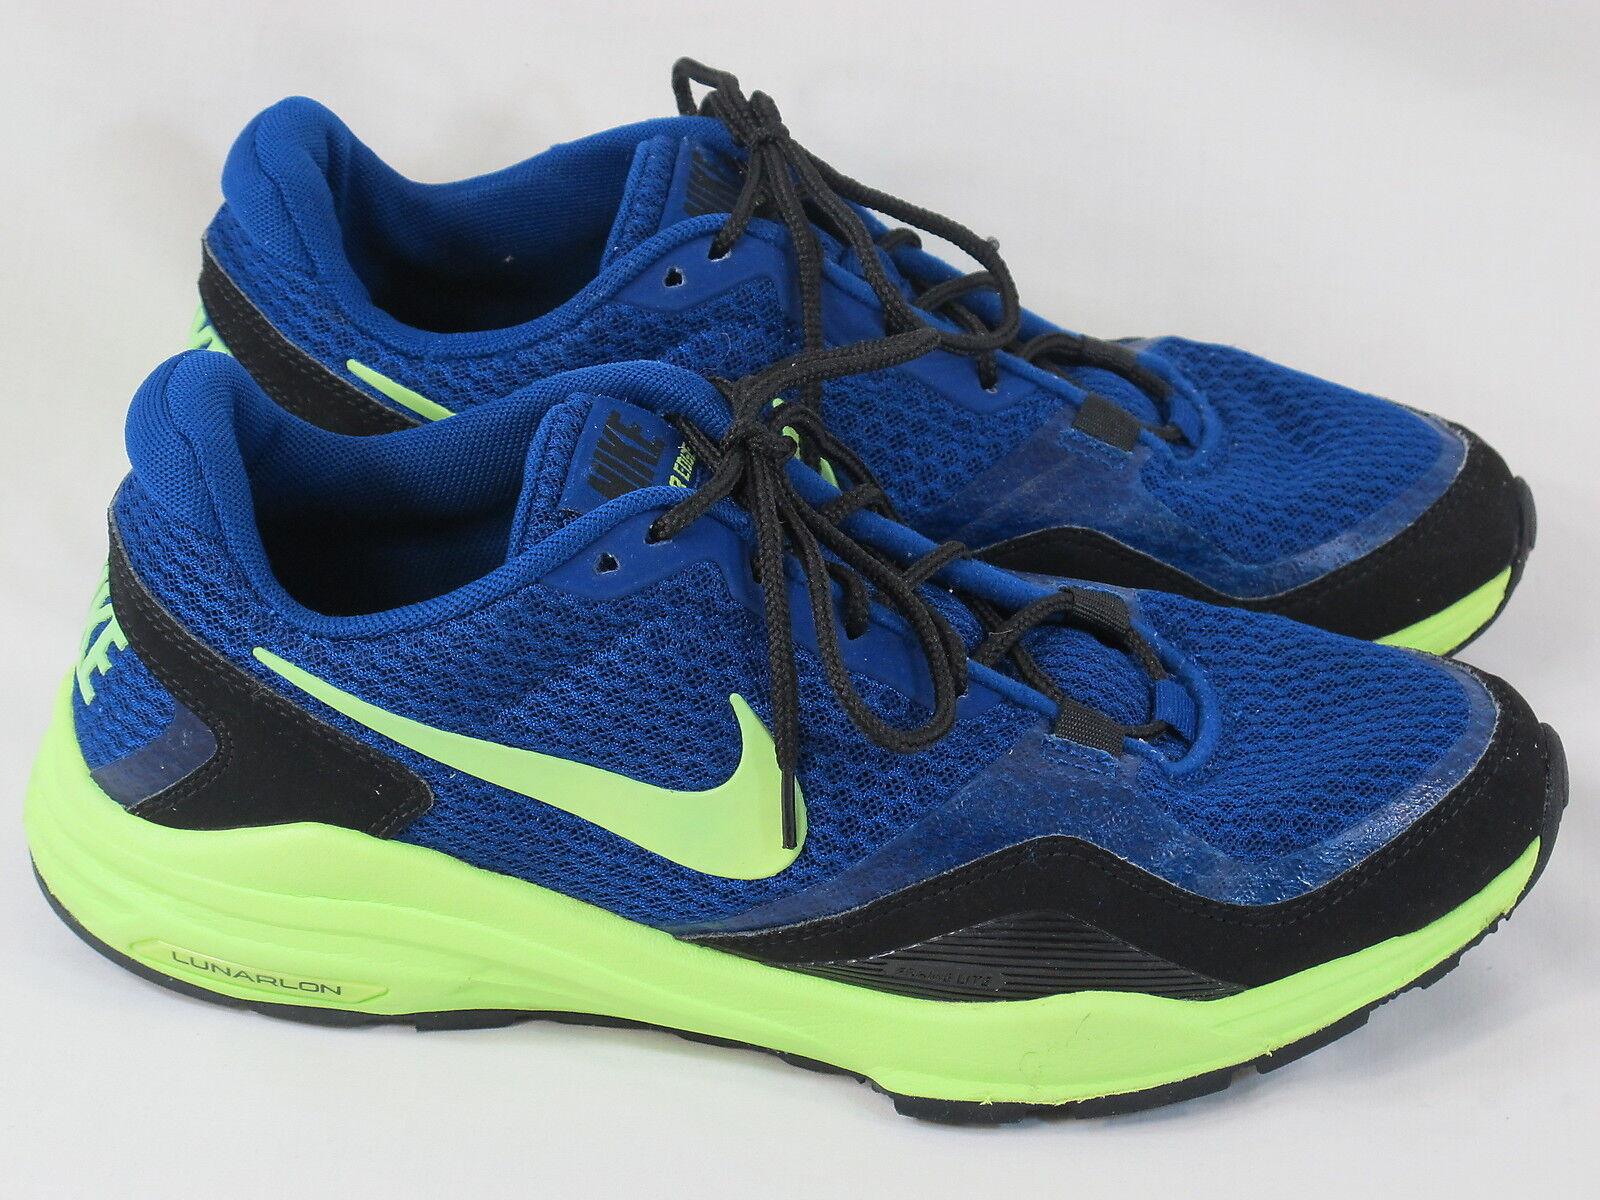 Nike Lunar Edge 12 Running Shoes Men's Comfortable Cheap women's shoes women's shoes